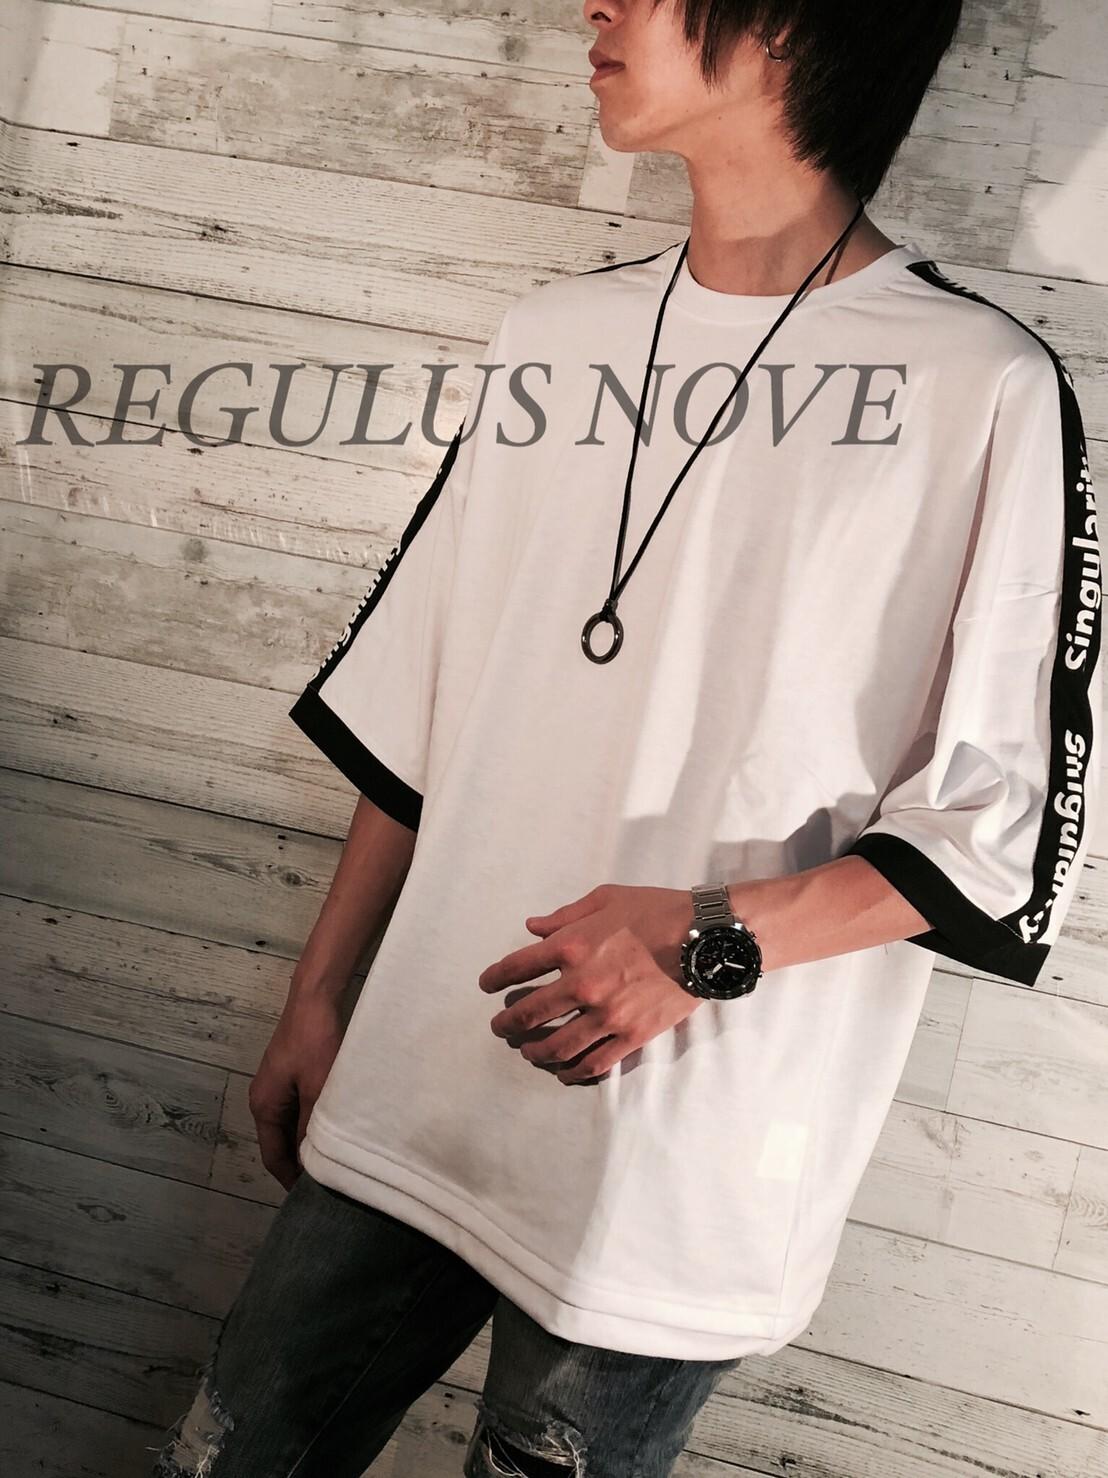 REGULUS NOVE ドルマンスリーブラインBIGT WHITE ユニセックス レディース メンズ オーバーサイズ 大きいサイズ 派手 個性的 ストリート ロック